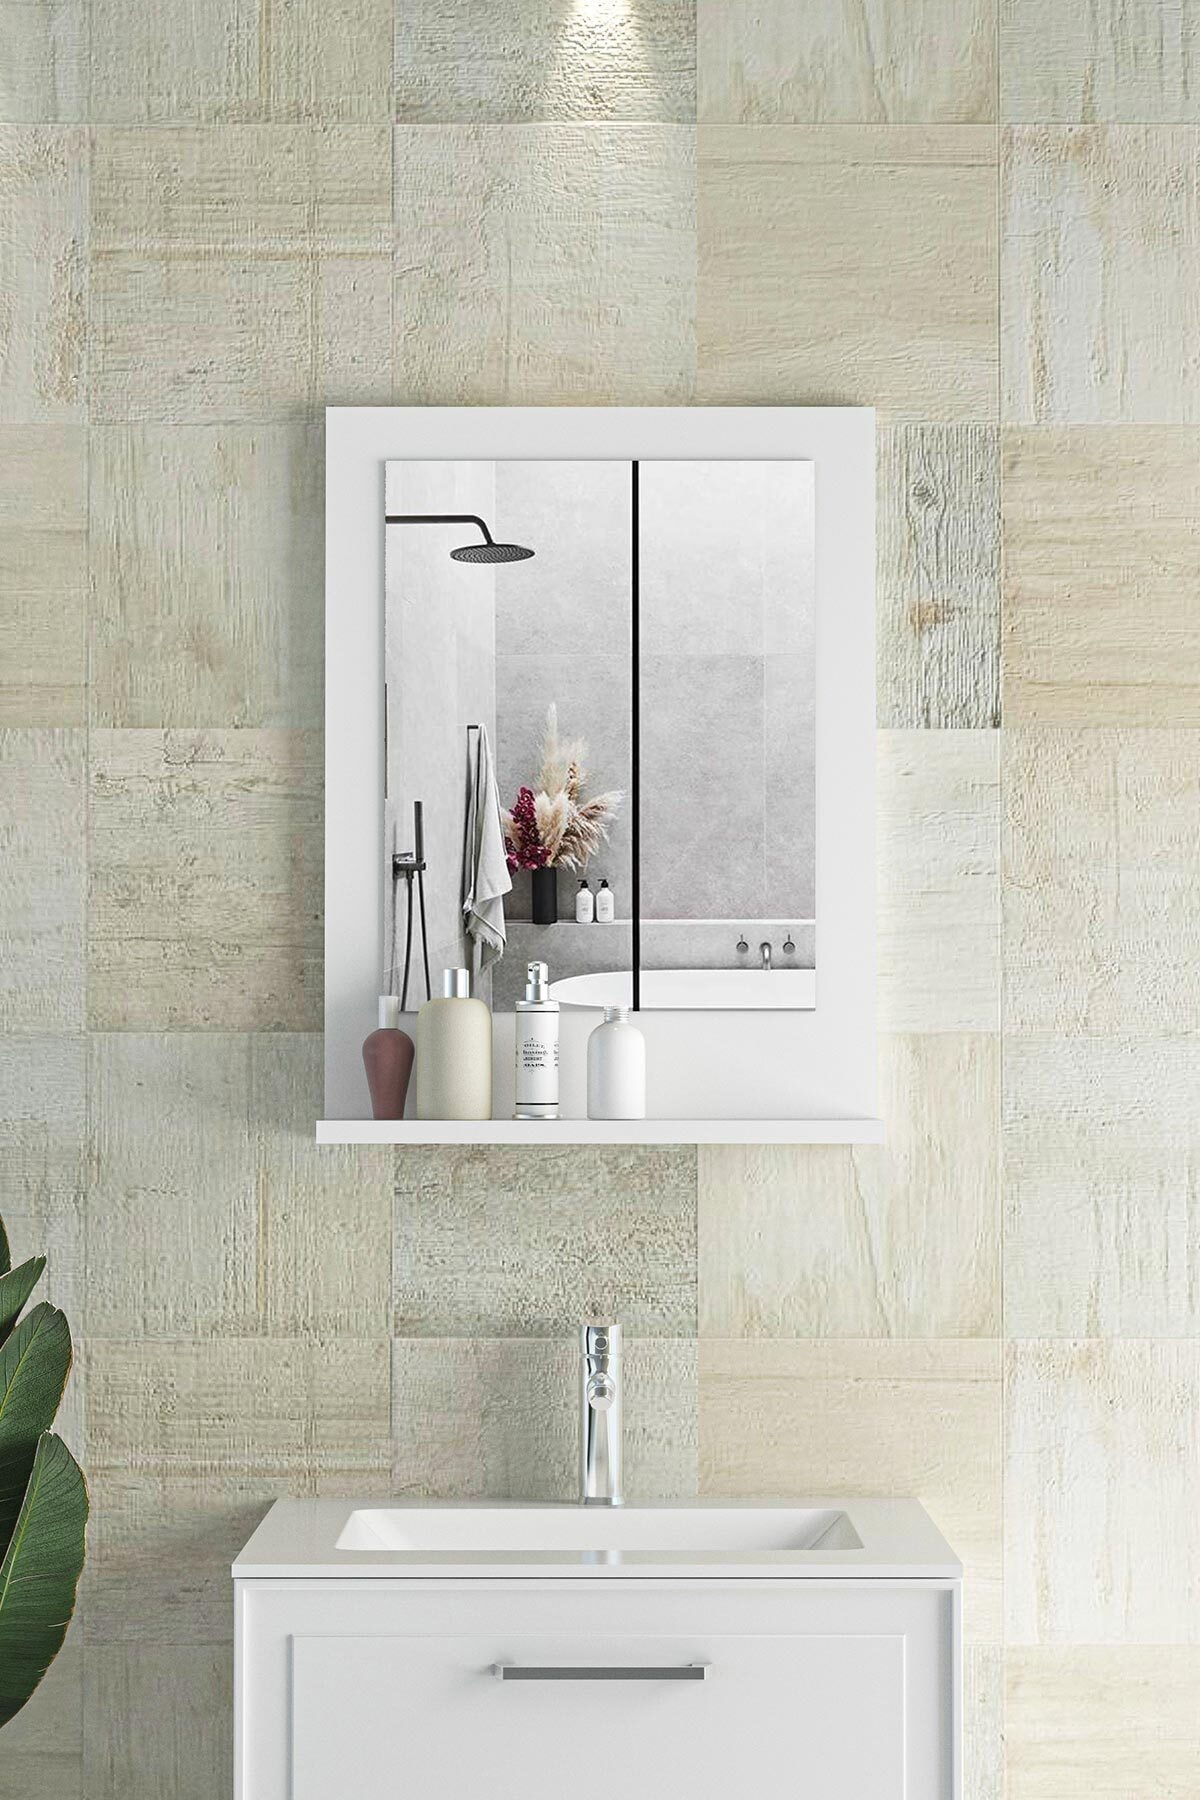 Verona 45x60cm Beyaz Raflı Banyo Aynası